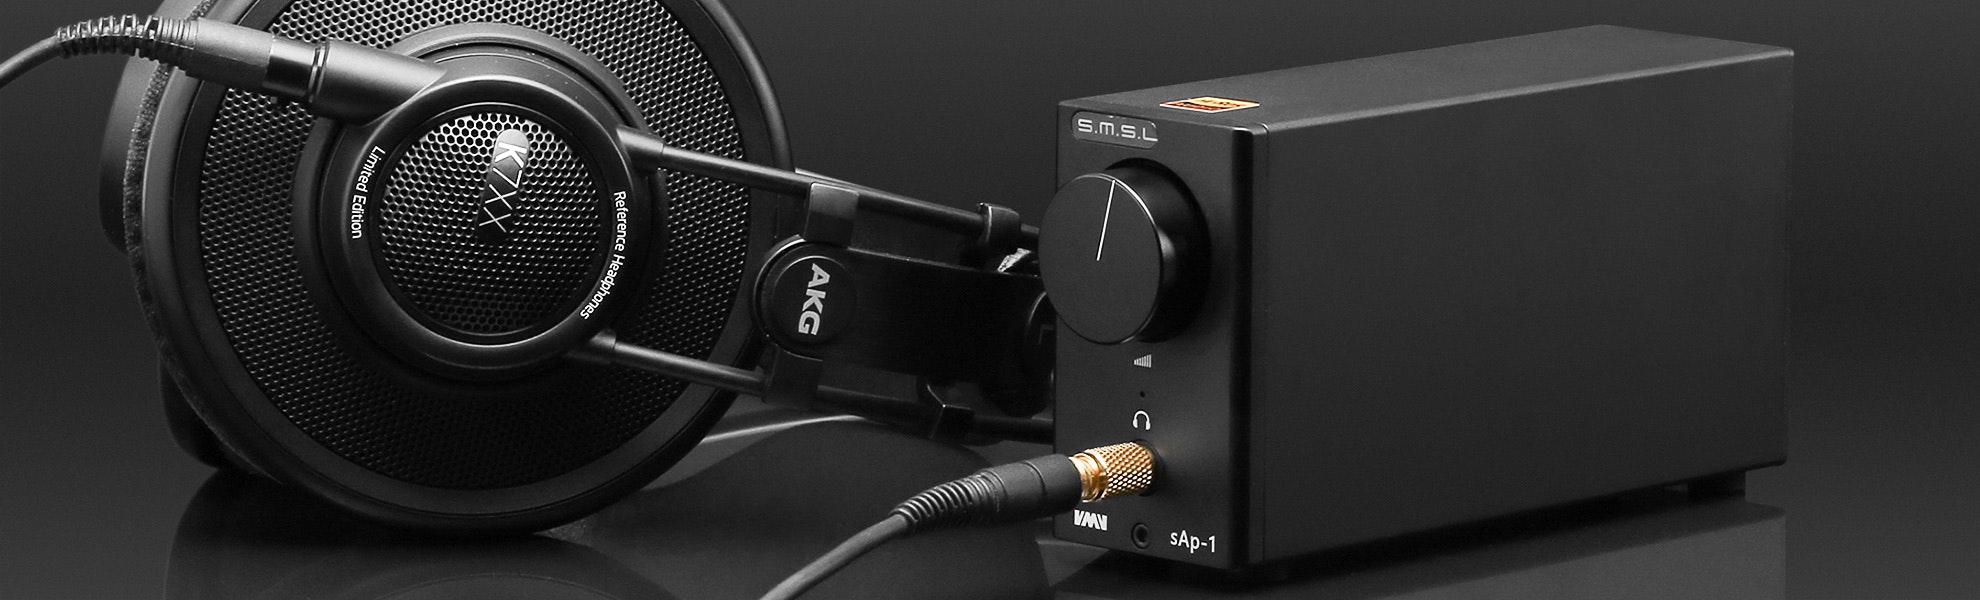 SMSL SAP-1 Headphone Amplifier